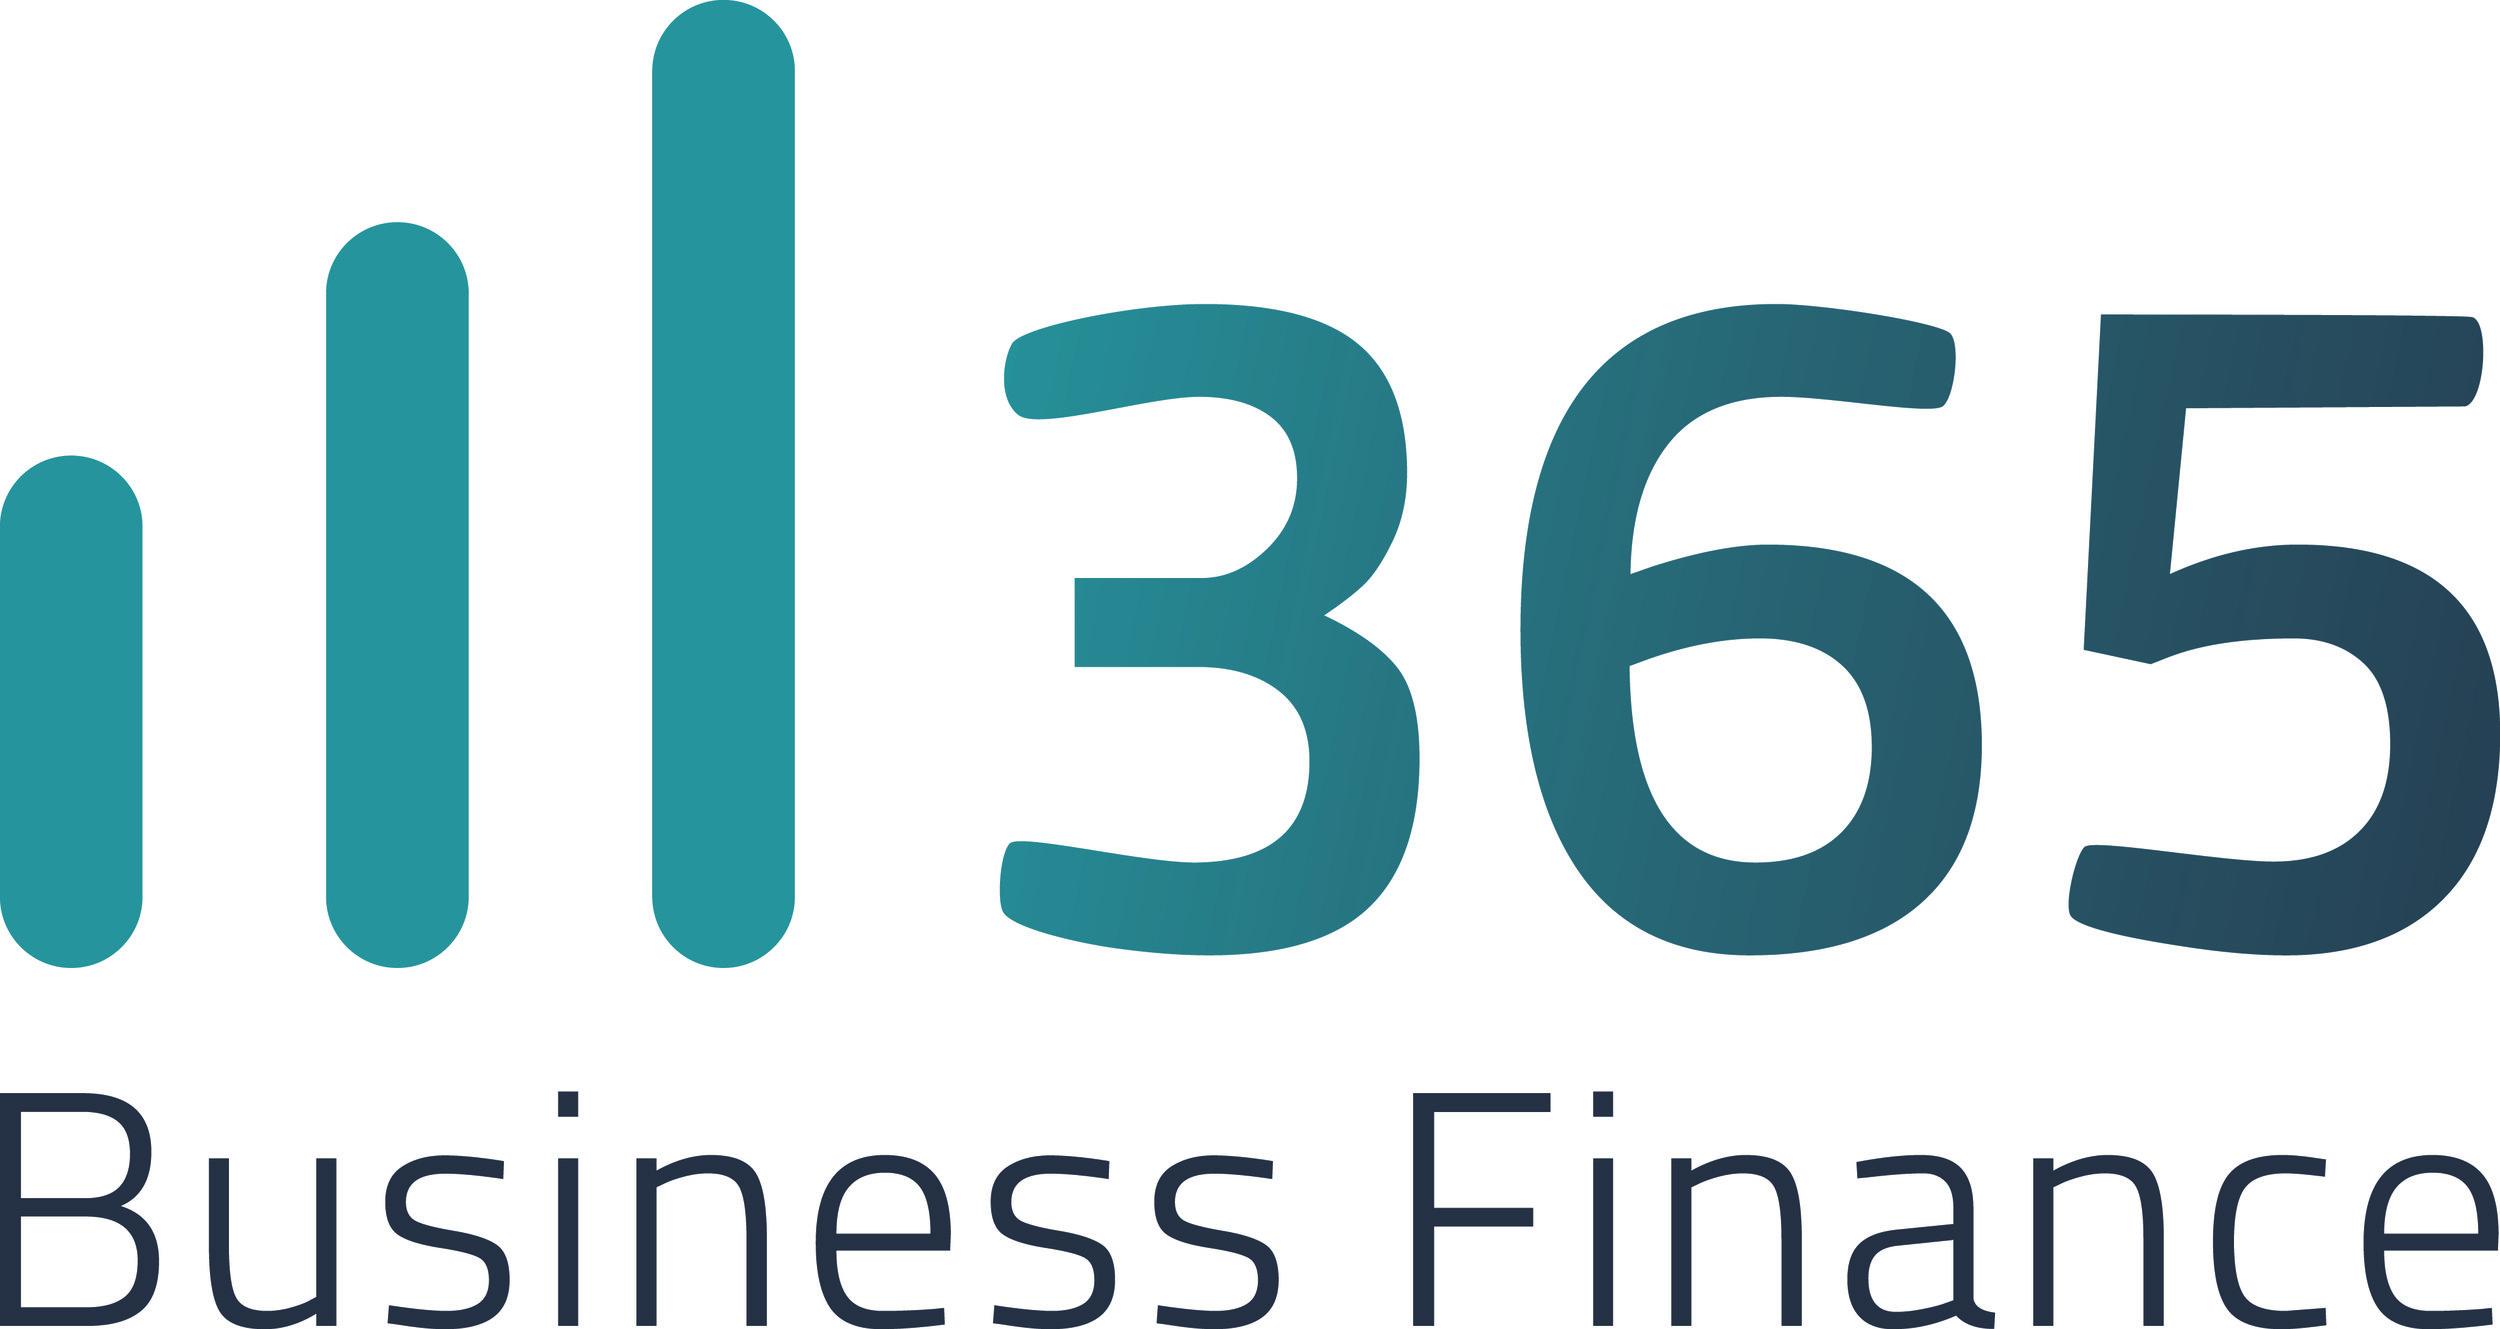 365 Business Finance